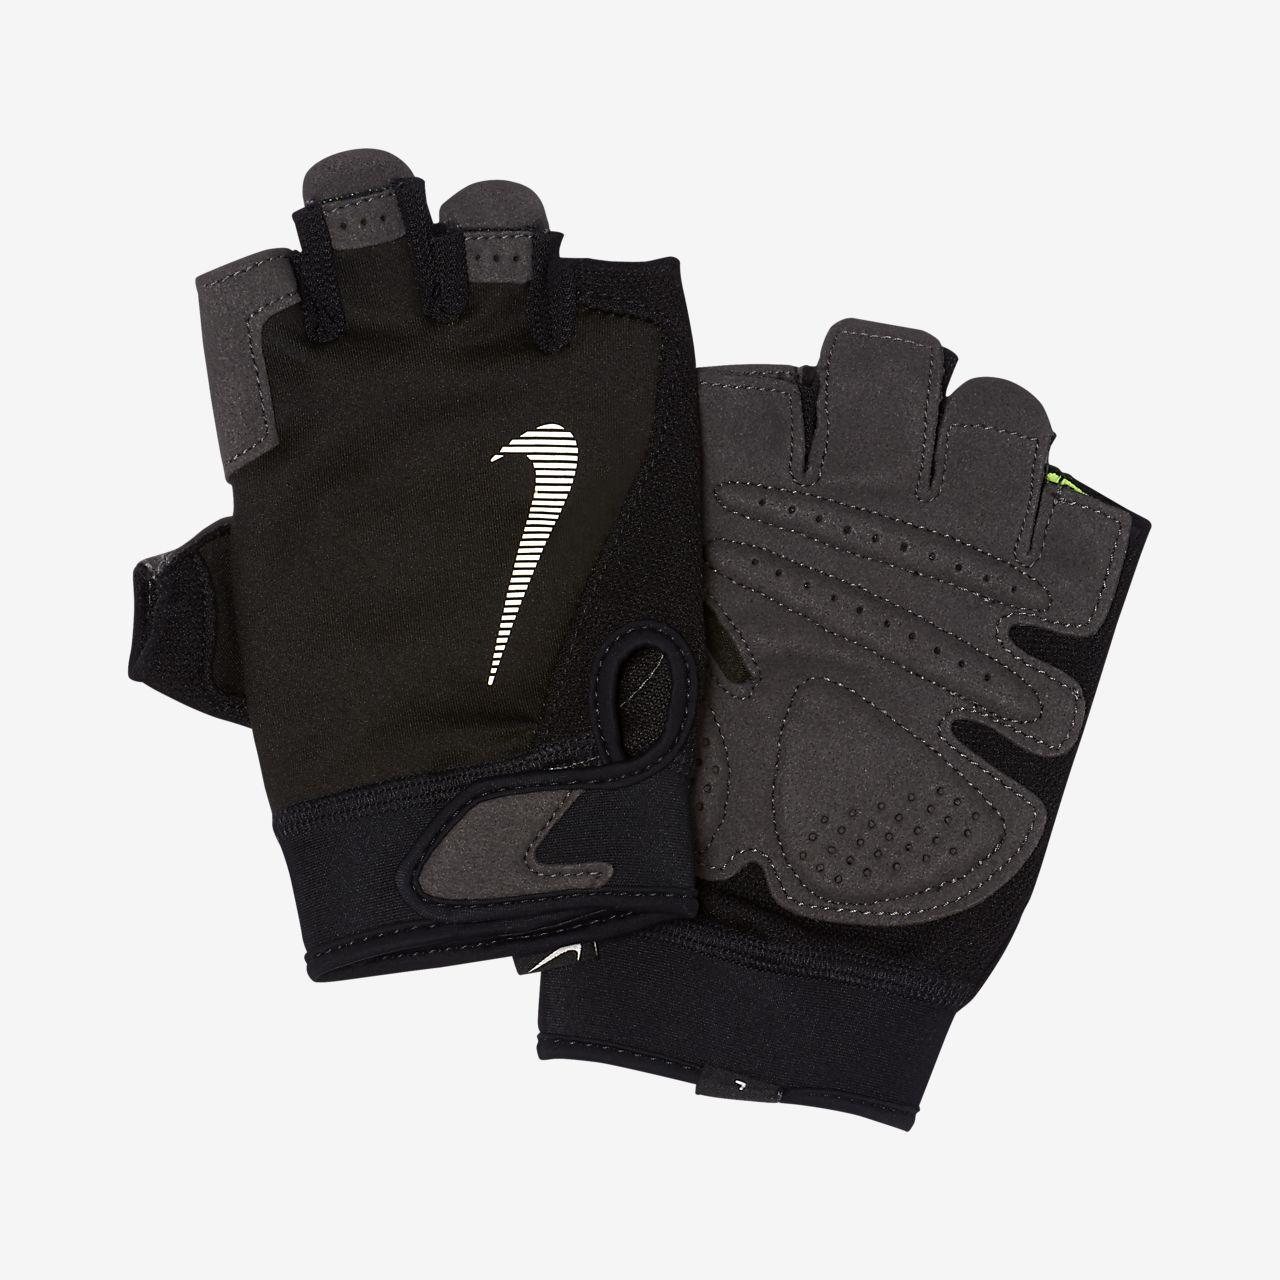 Nike Ultimate Guants d'entrenament - Home